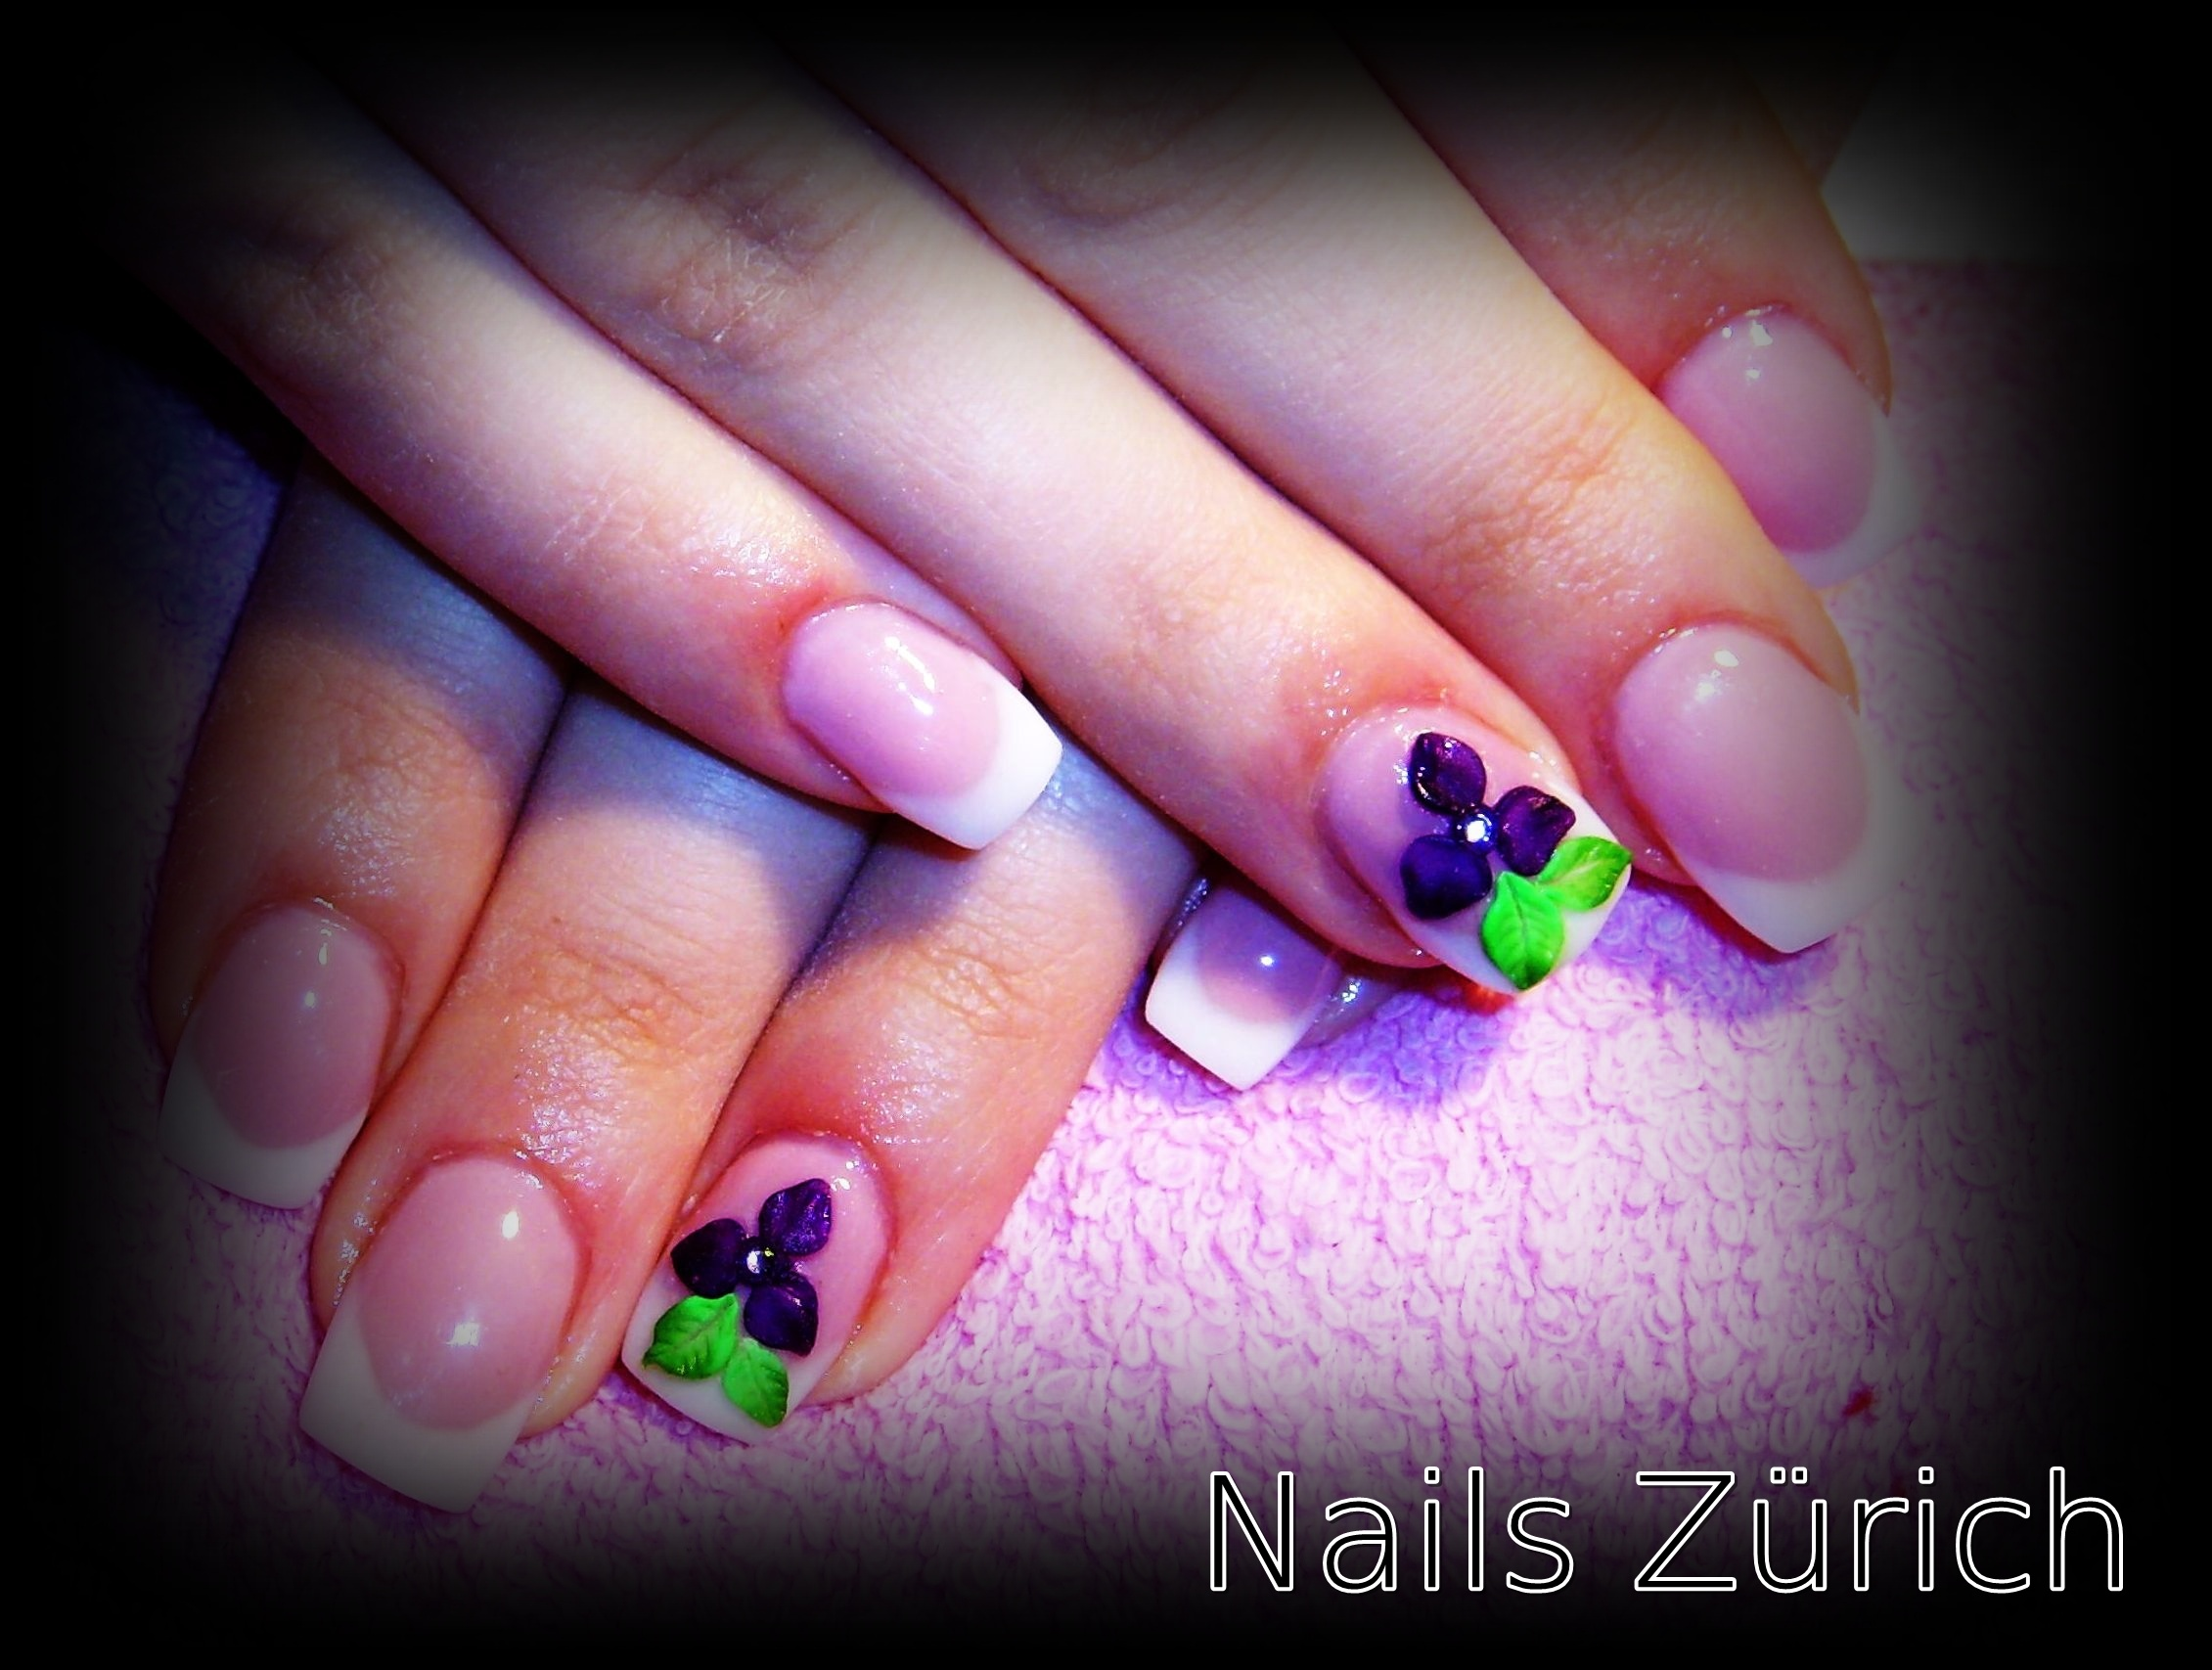 utána Anett nails Zürich